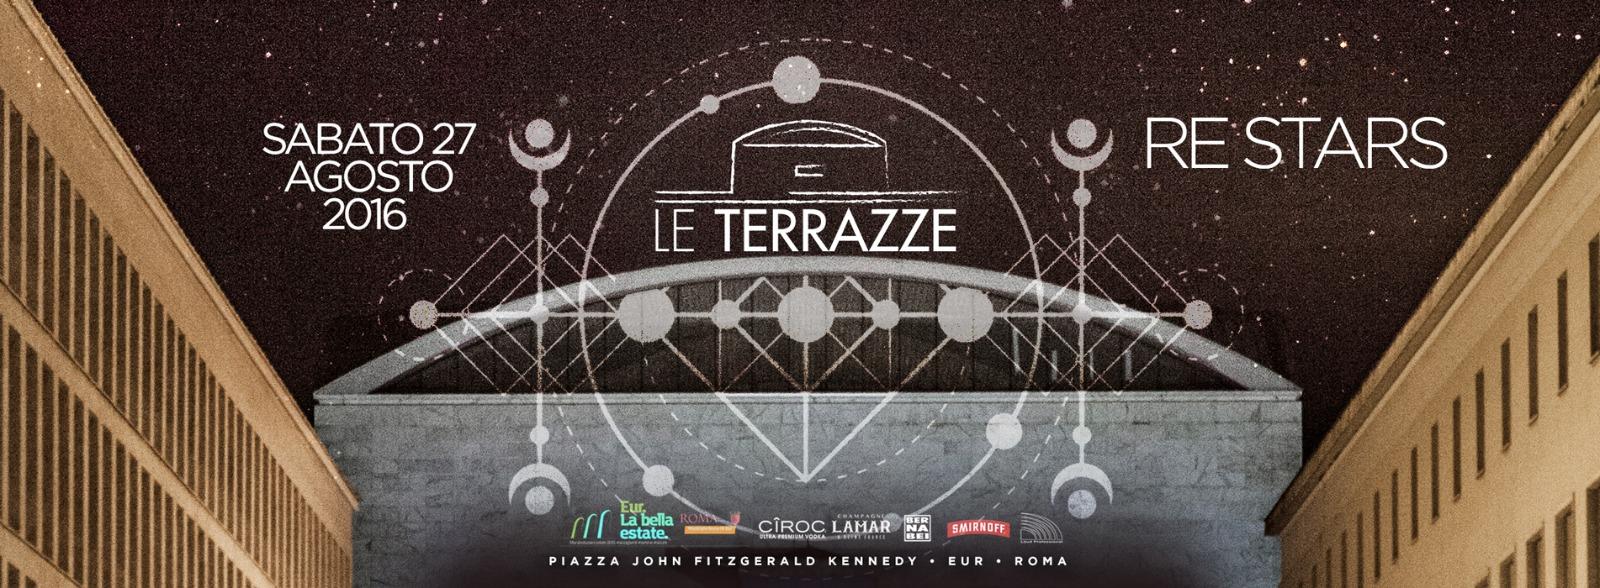 Le Terrazze Discoteca Roma sabato 27 Agosto ReStars Lista Globo